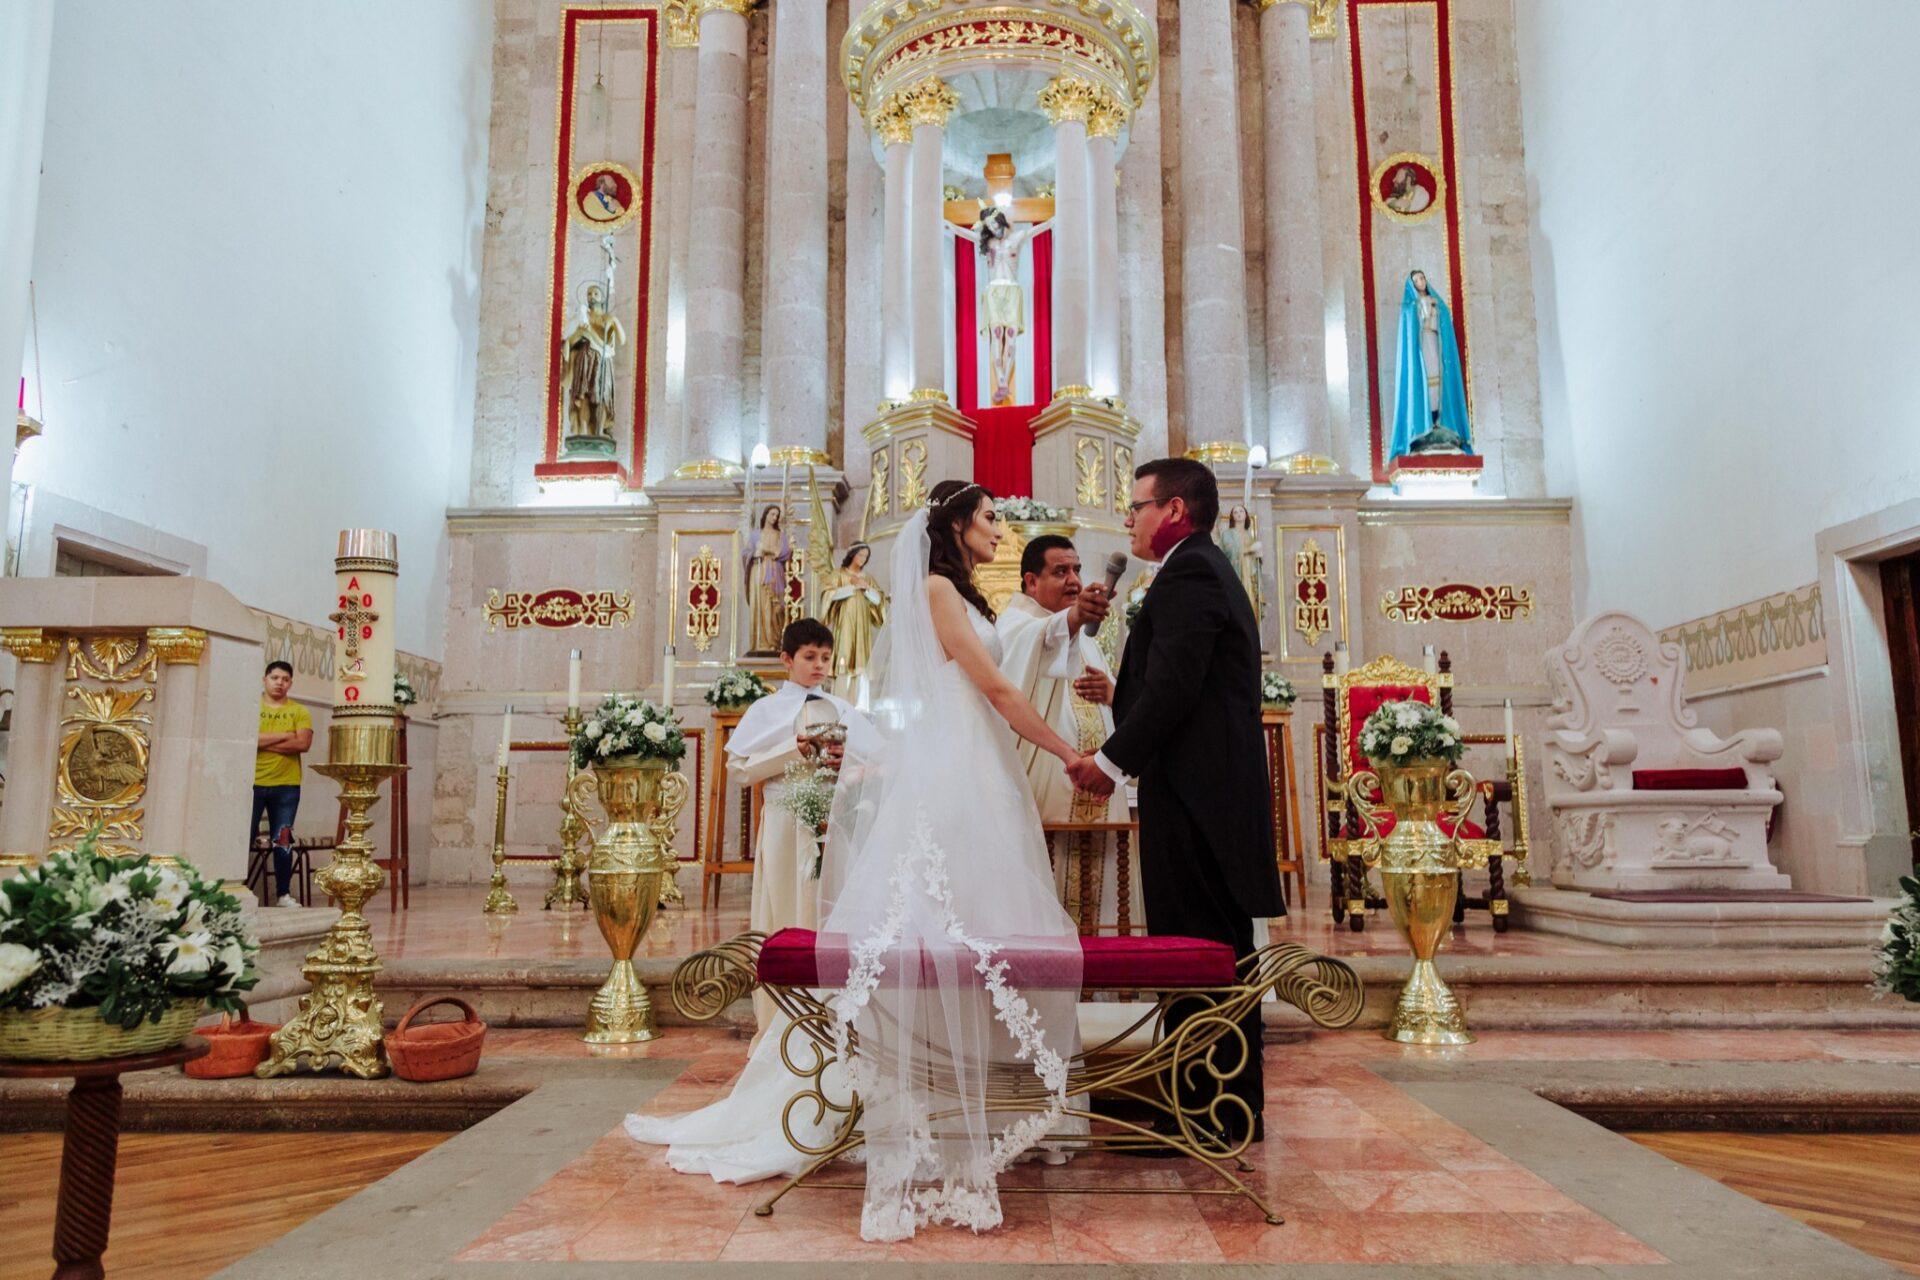 javier_noriega_fotografo_bodas_teul_zacatecas_wedding_photographer12a